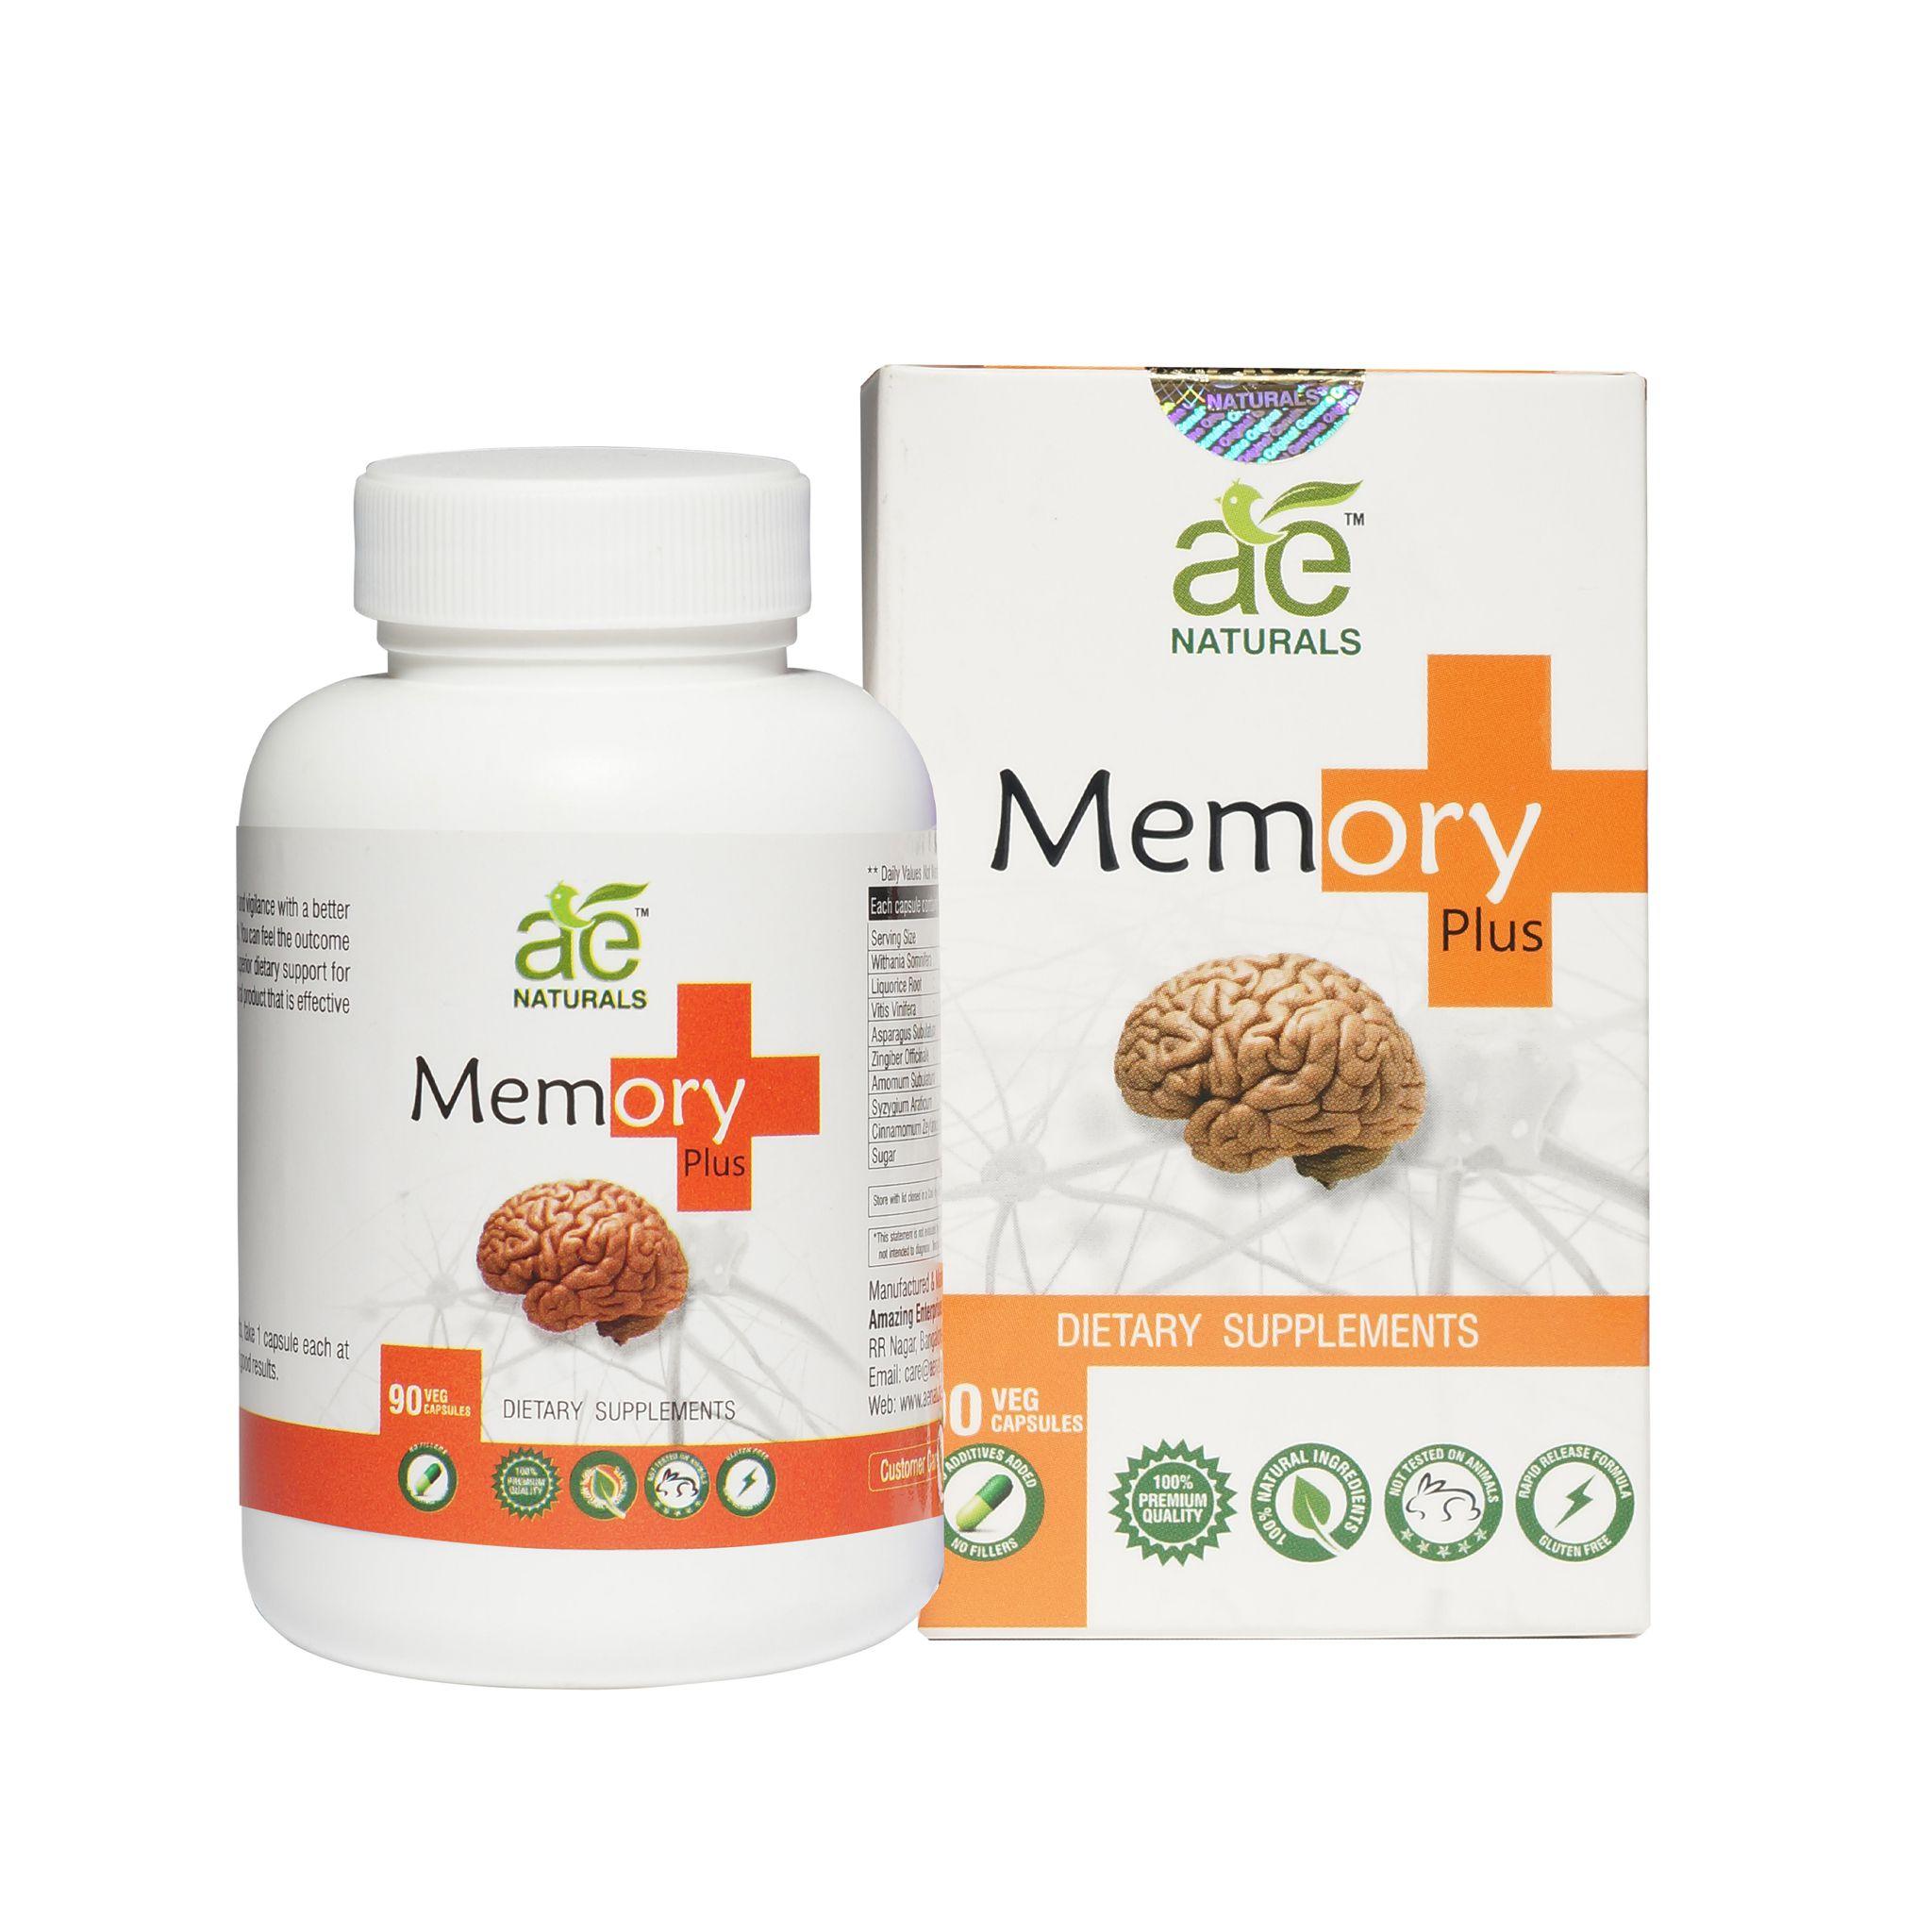 AE Naturals memory Plus Capsules Herbal Suppliment 90 Veg Caps Health Drink 90 gm